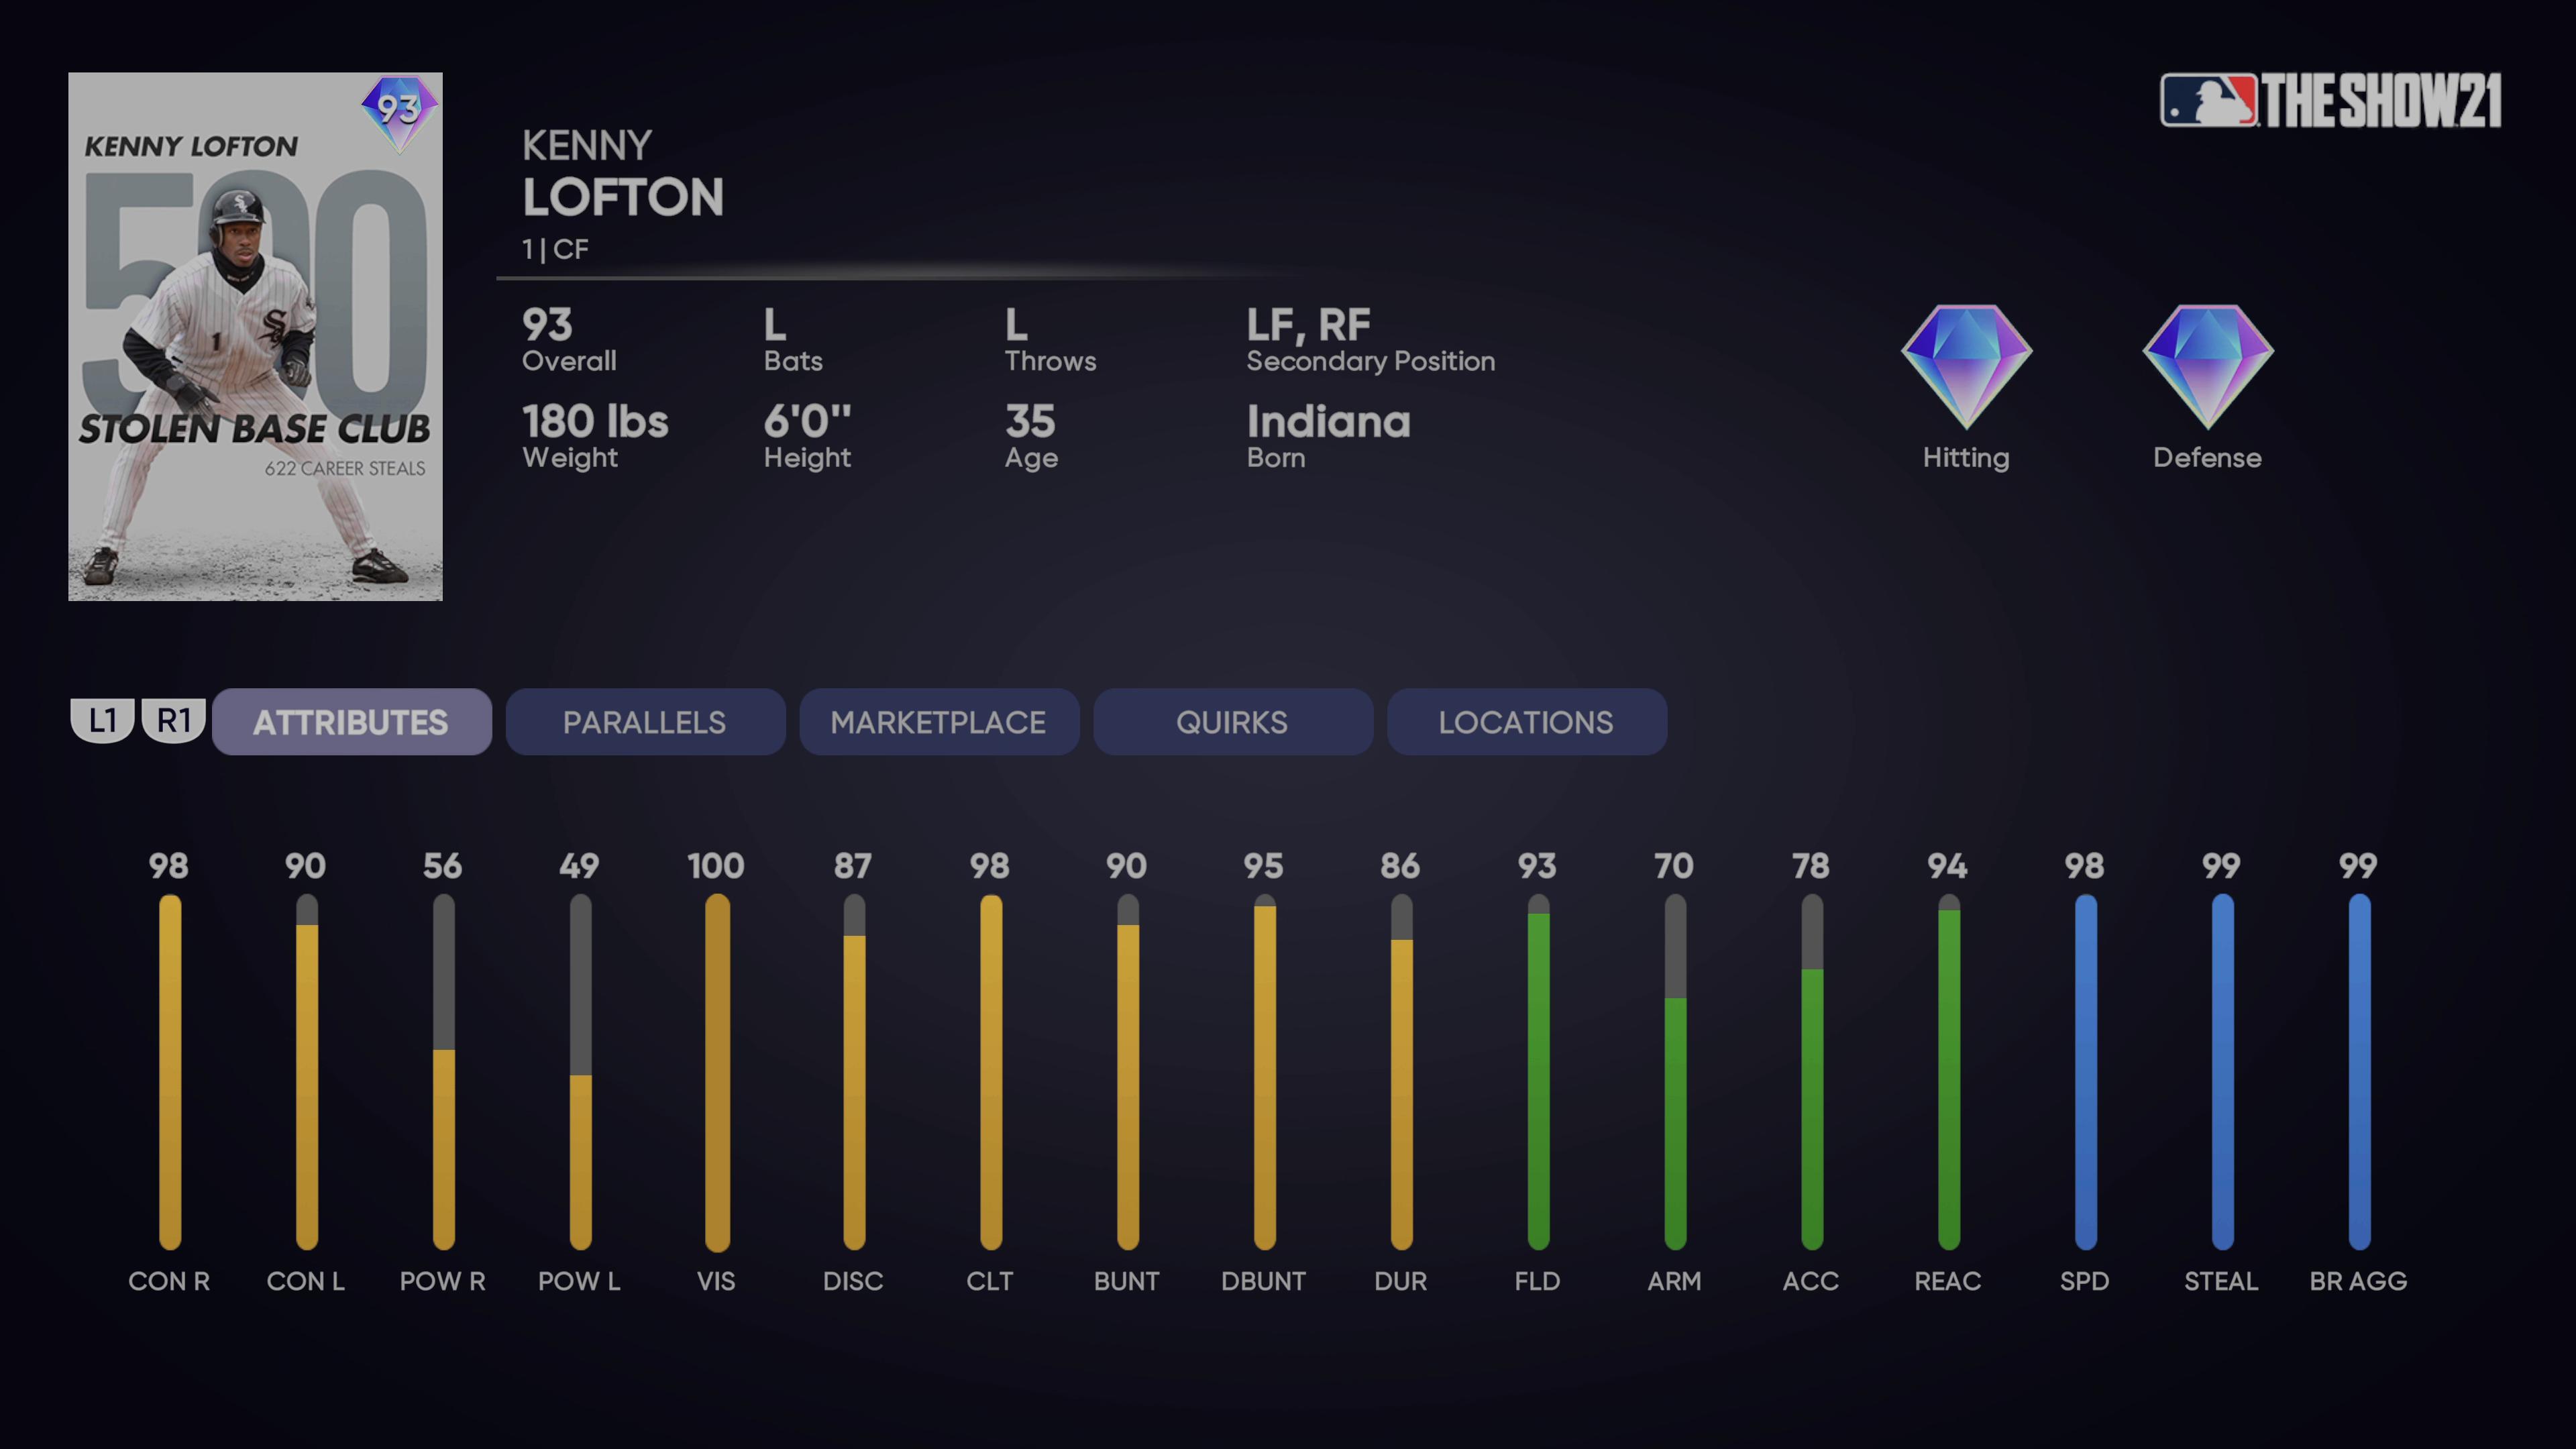 MLB The Show 21 - Kenny Lofton_2021-04-16_02-21-27